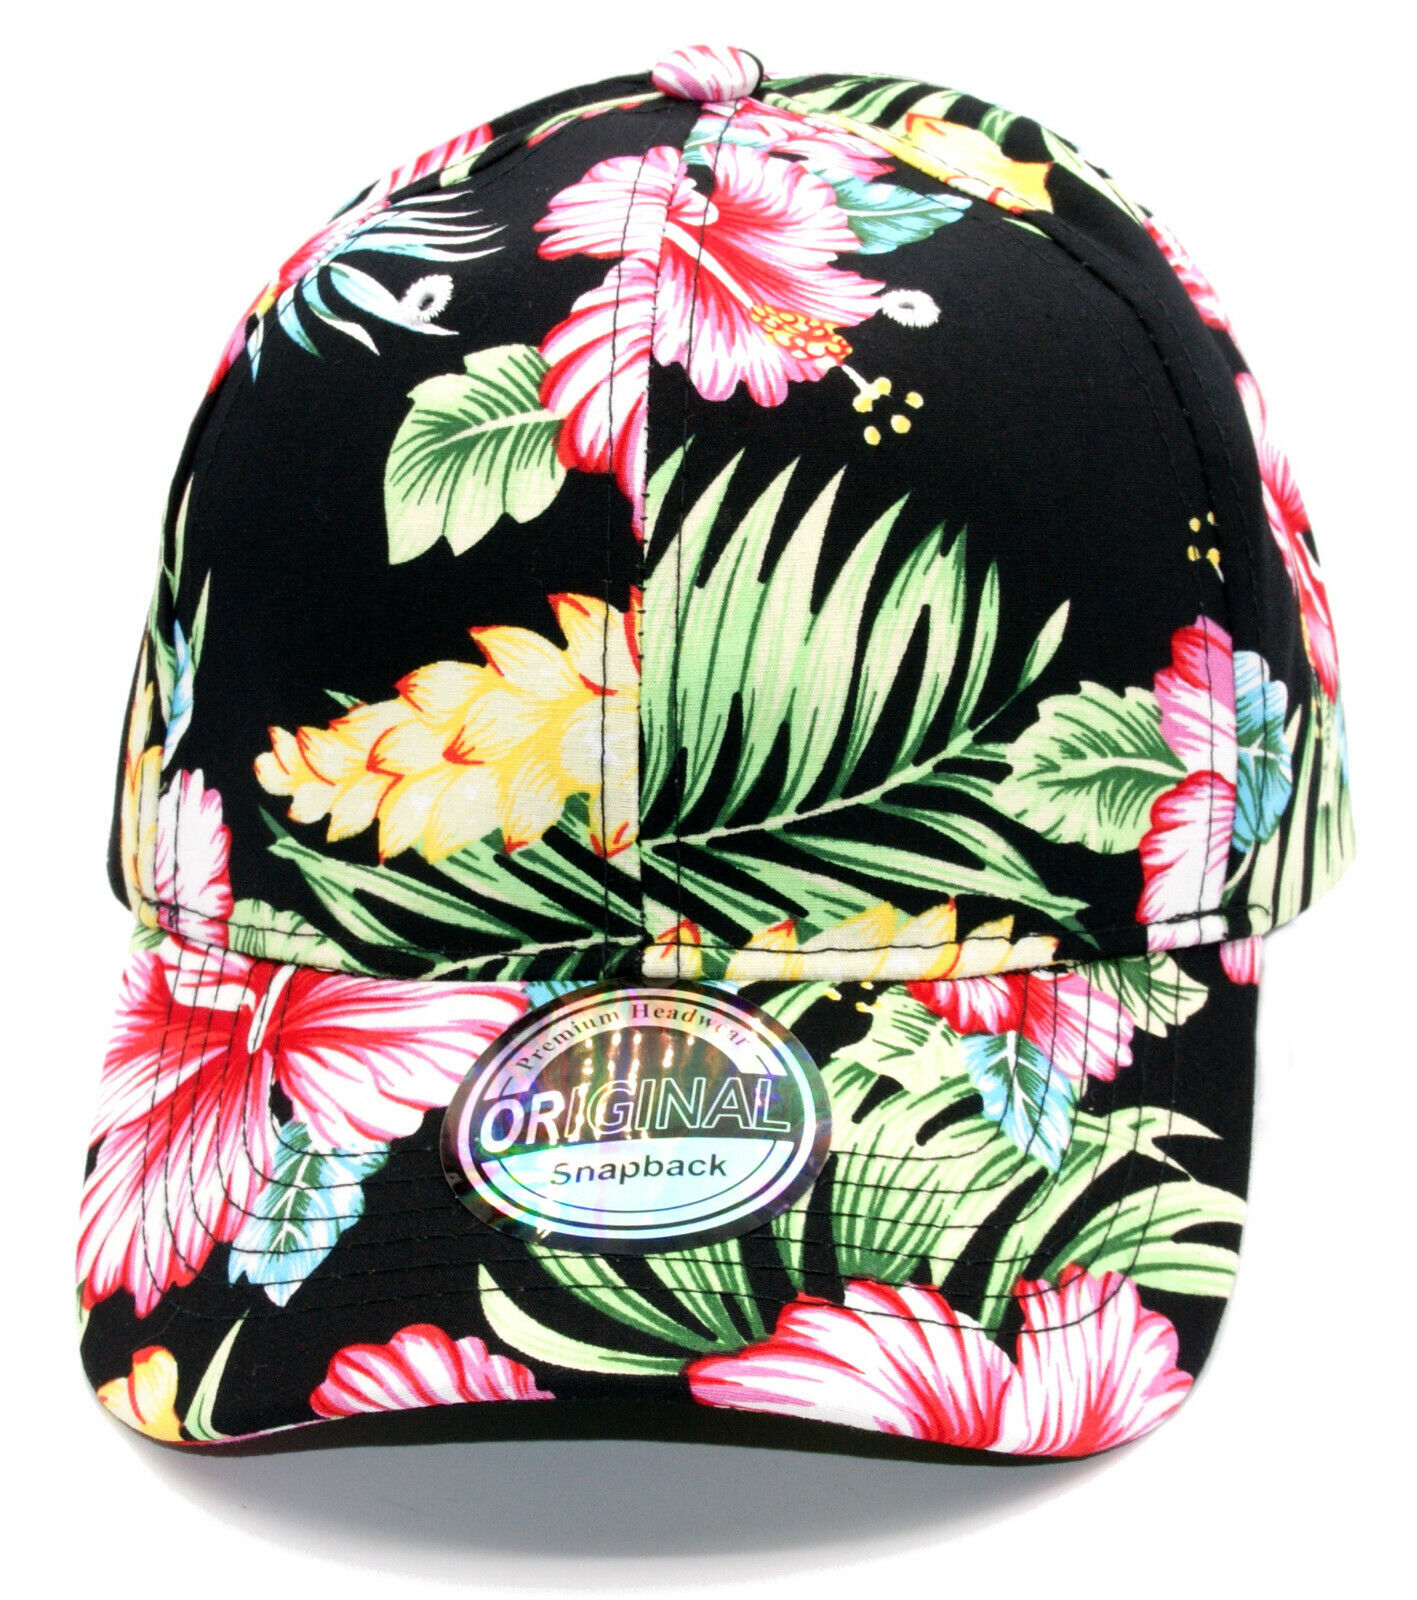 Cappy Klettverschluss Hawaii gebogen ohne Logo Kappe Cap Basecap Unisex Mütze